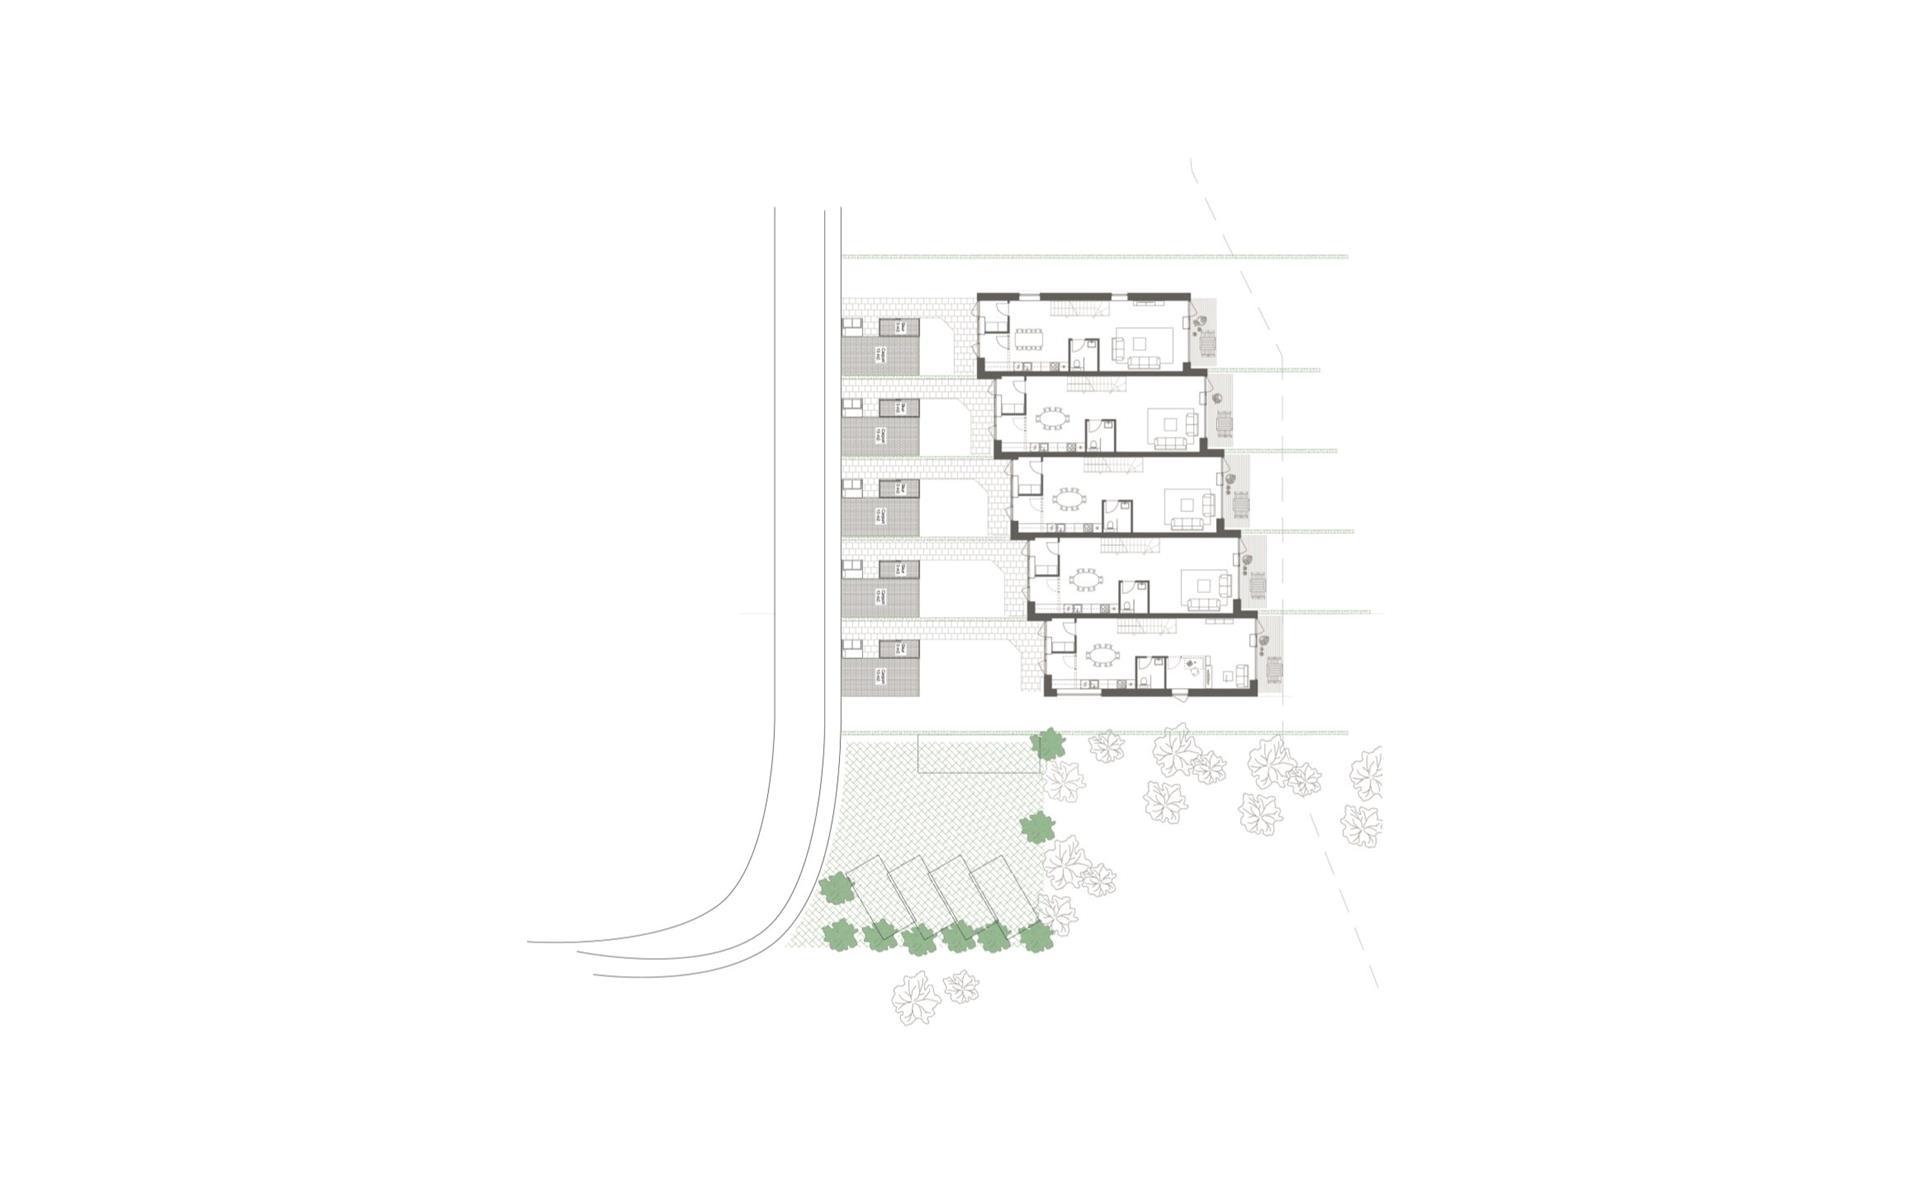 Rækkehus på Mølleåparken i Kongens Lyngby - Plantegning